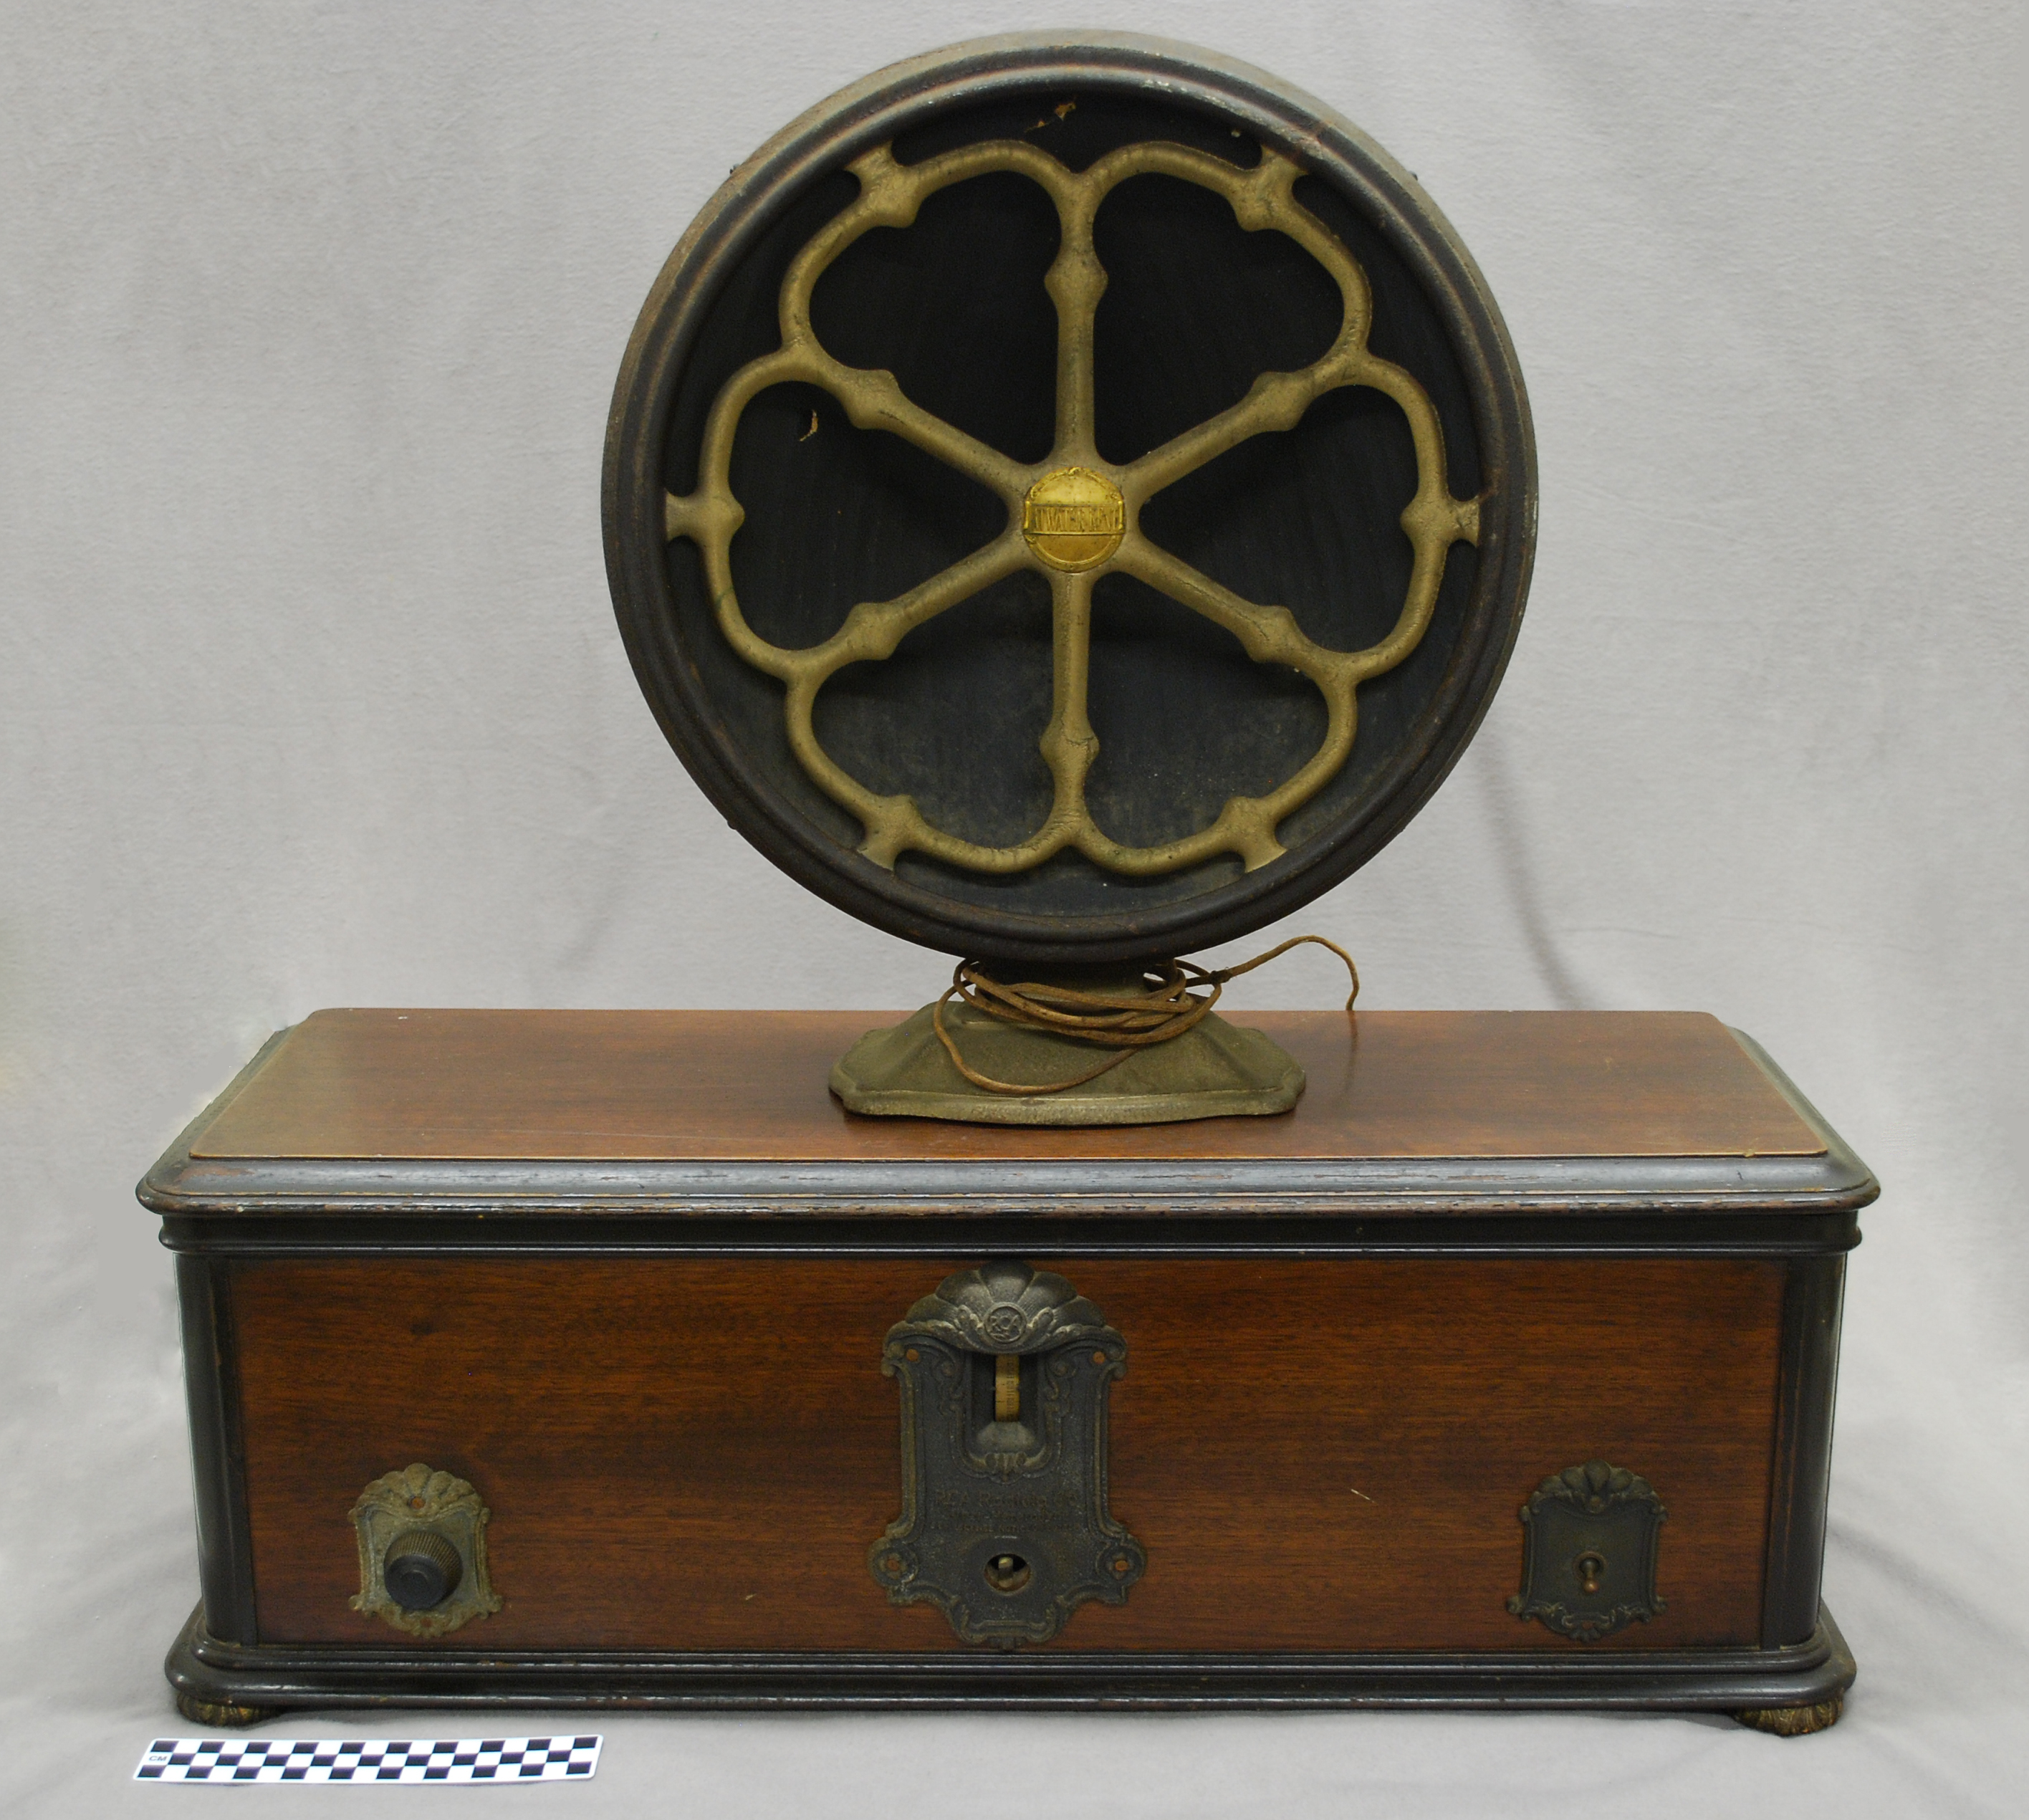 Object: Radio | UTSA Institute Of Texan Cultures